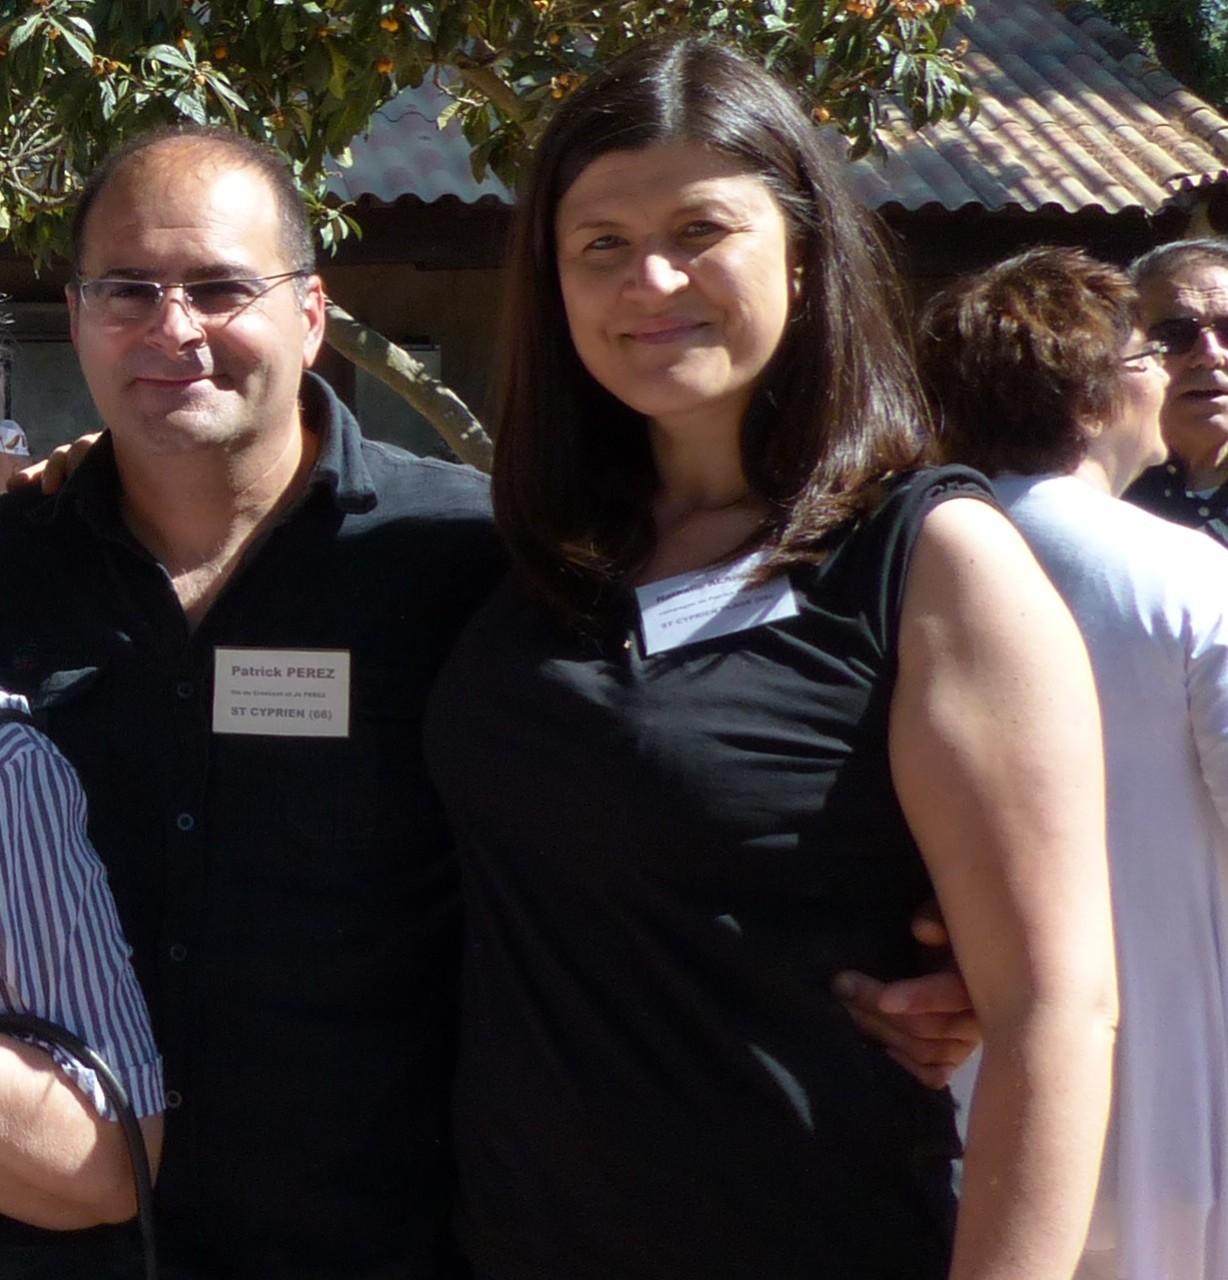 Patrick PEREZ  (fils de Crescent et Jo PEREZ) & Nathalie ALARCON (sa compagne)